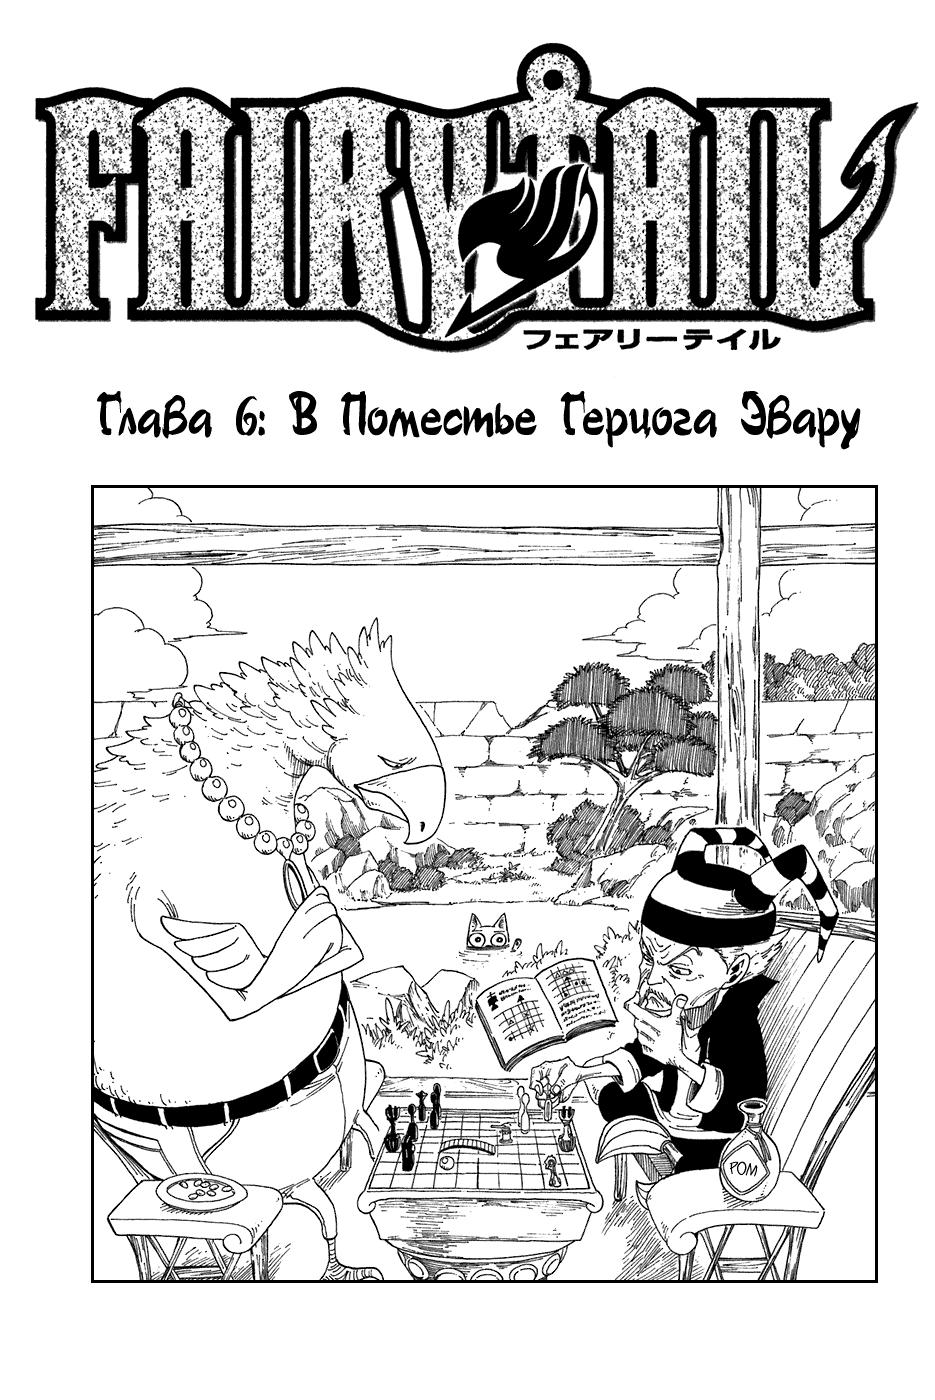 Манга Fairy Tail / Фейри Тейл / Хвост Феи Манга Fairy Tail Глава # 6 - В поместье герцога Эвару, страница 1